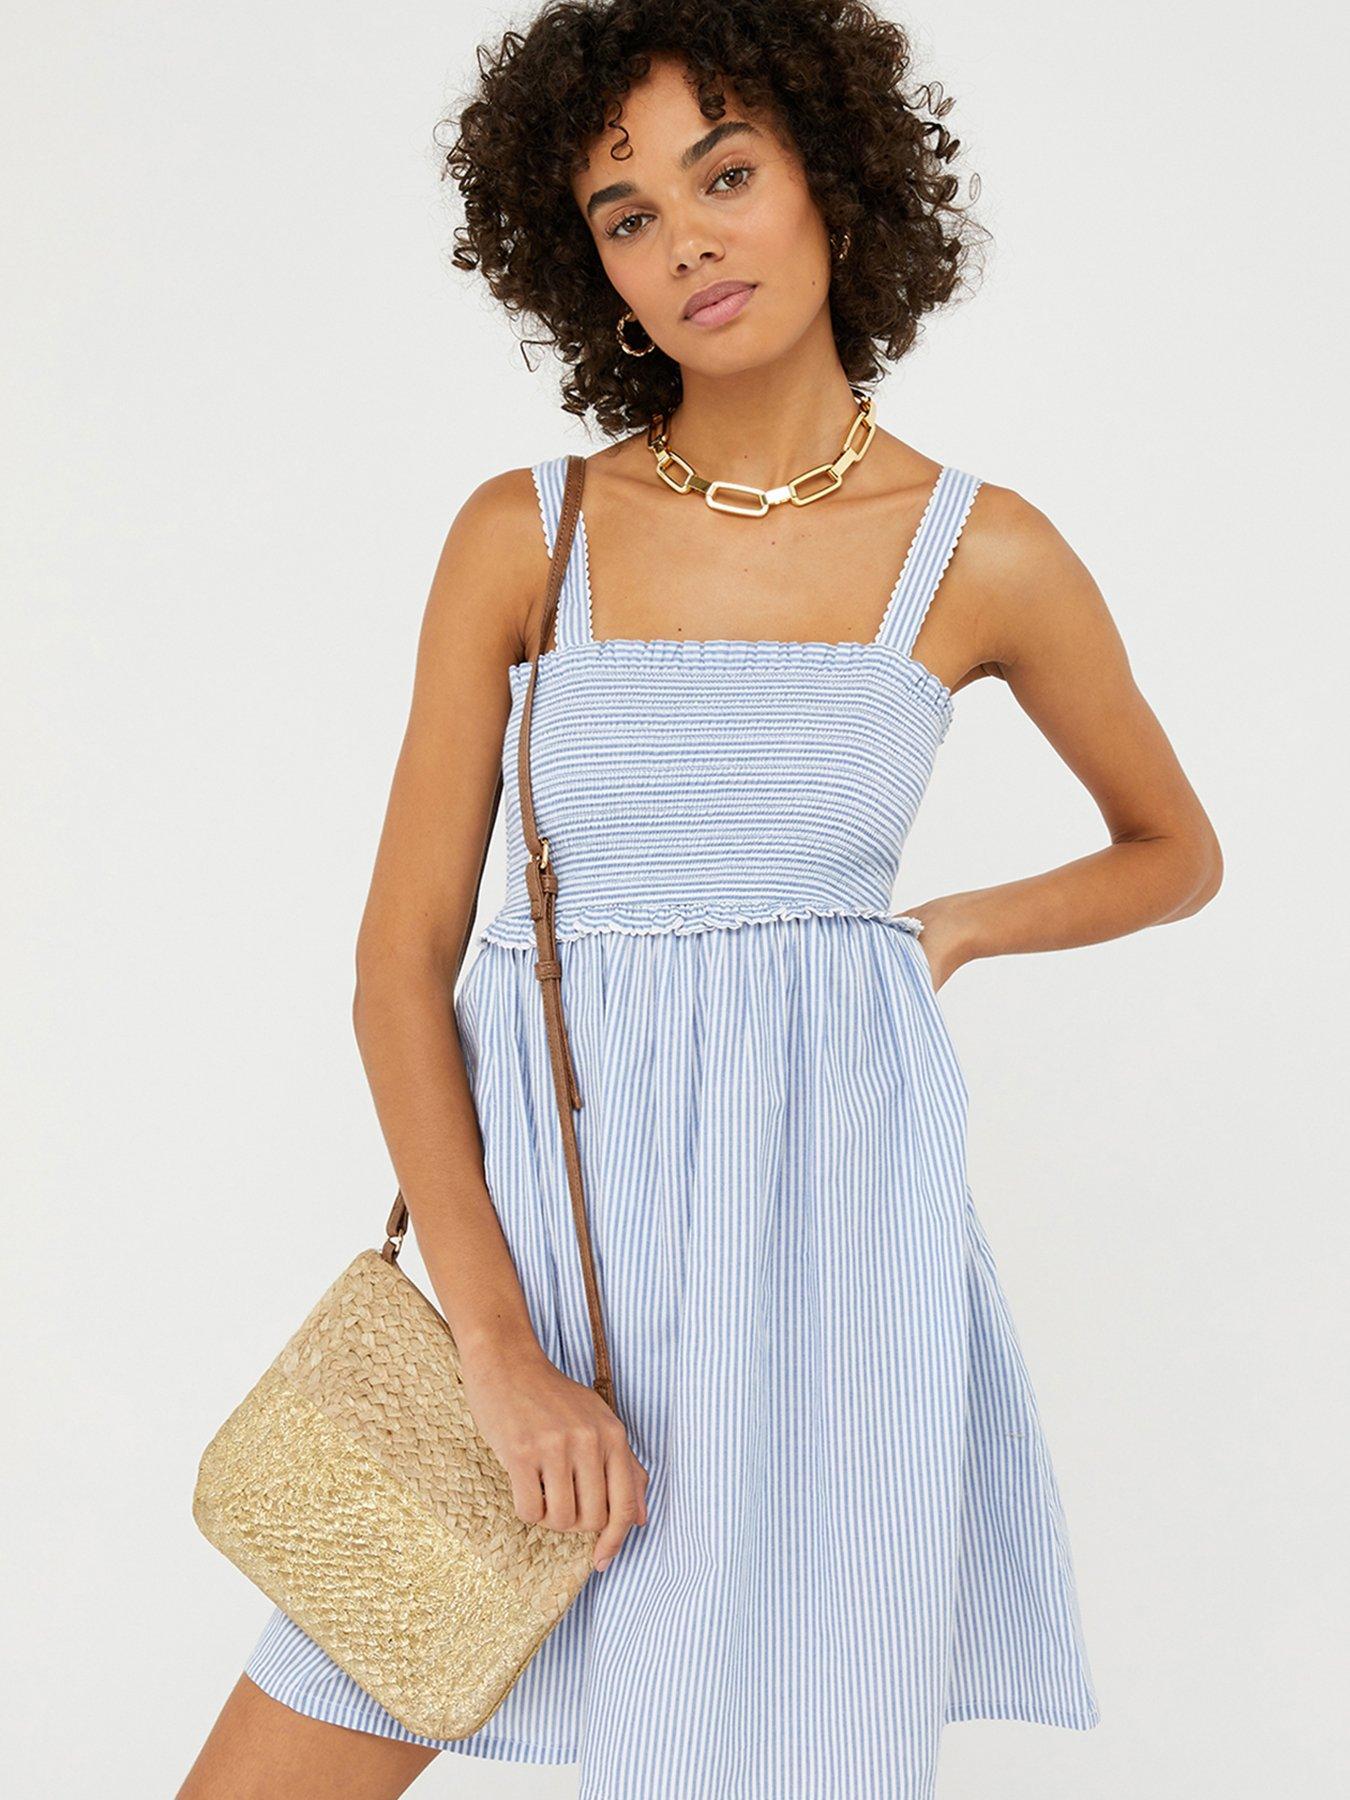 BRAND NEW LADIES TUNIC FLOWER DRESS SALE OFFER UK STOCK